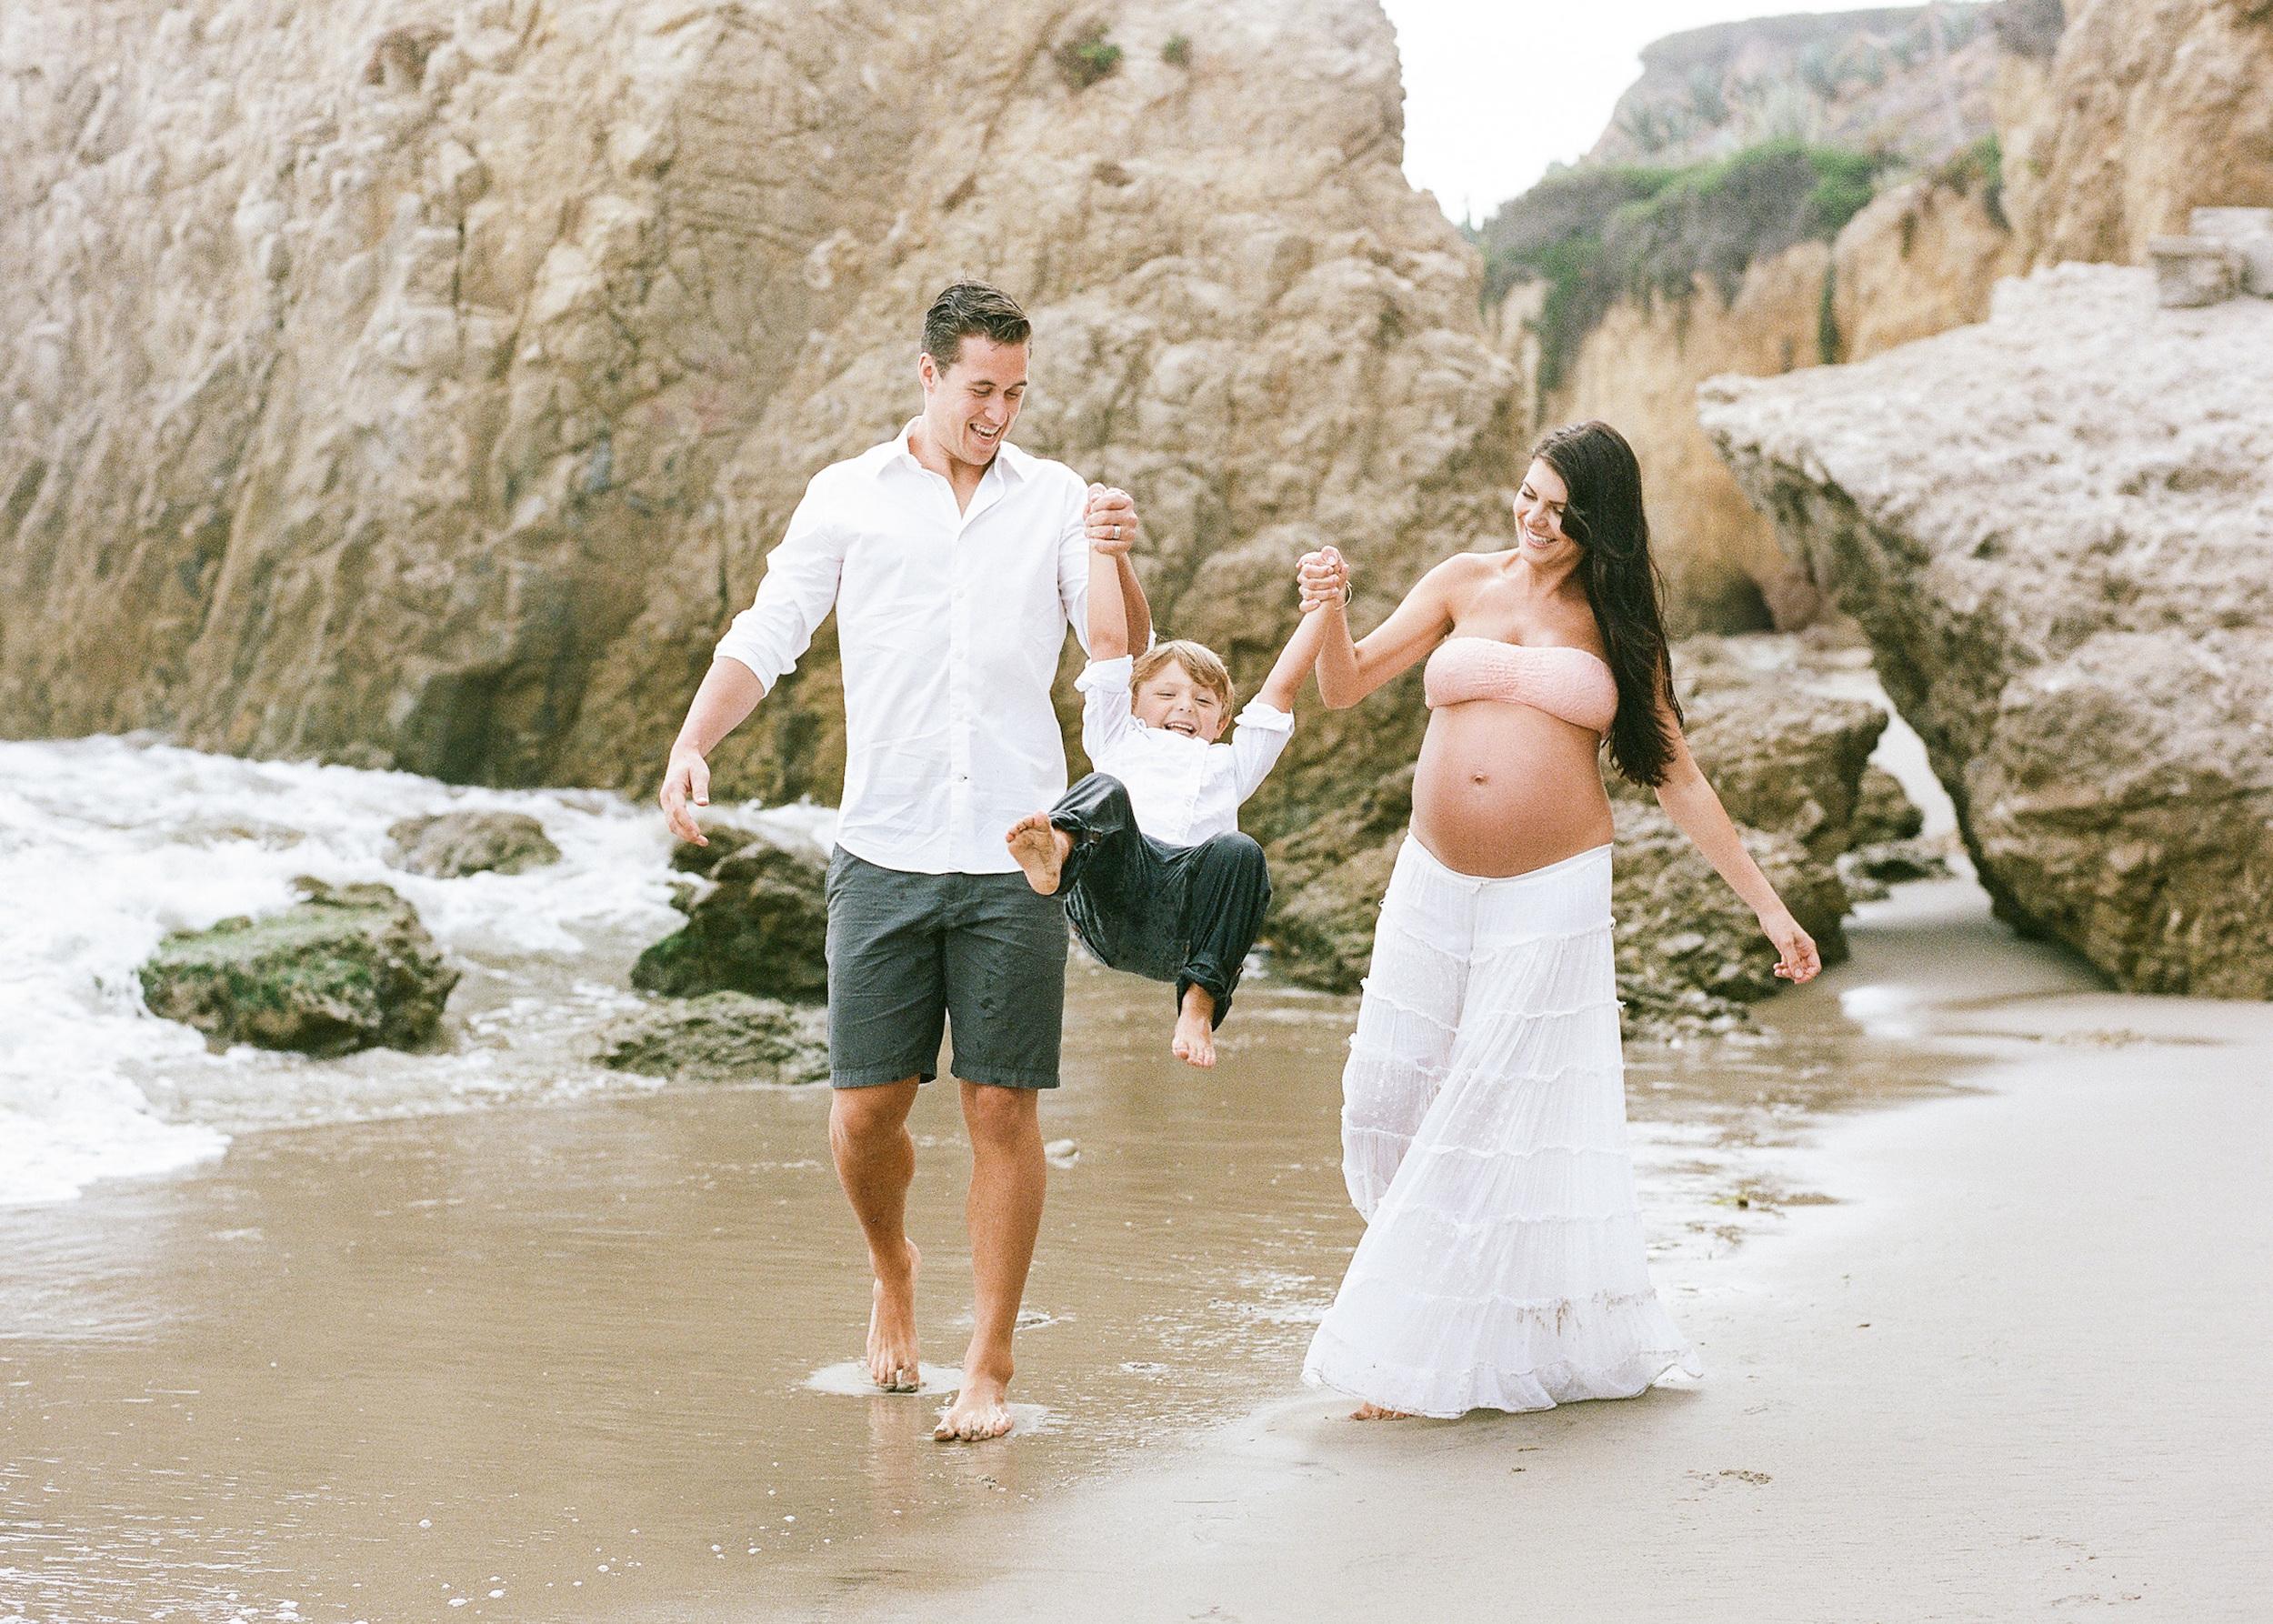 Malibu-El-Matador-Beach-Family-Session.jpg